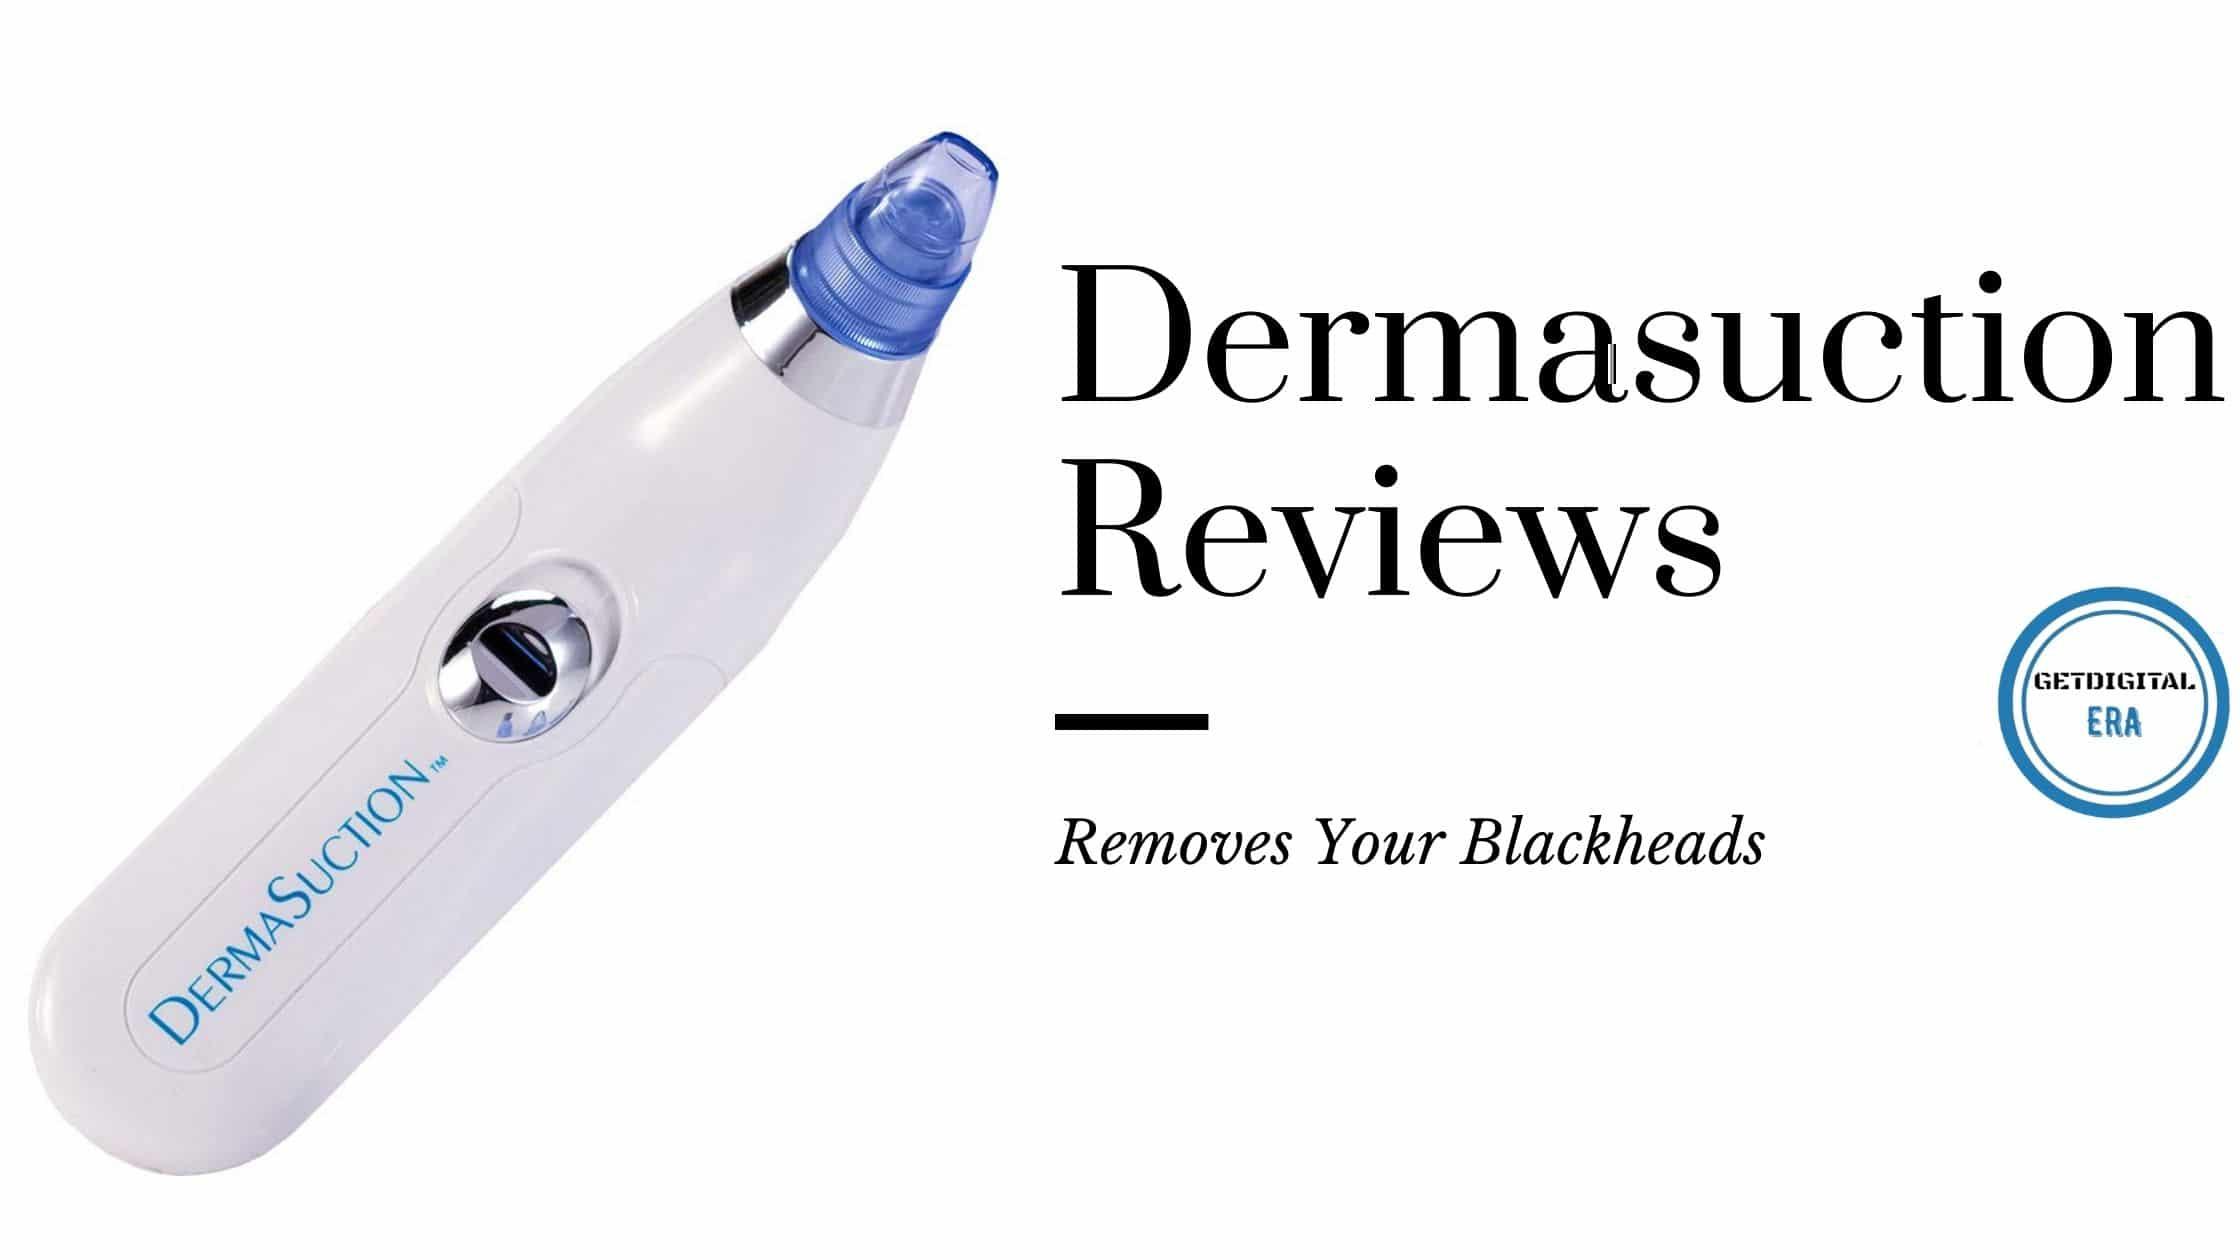 Dermasuction Reviews